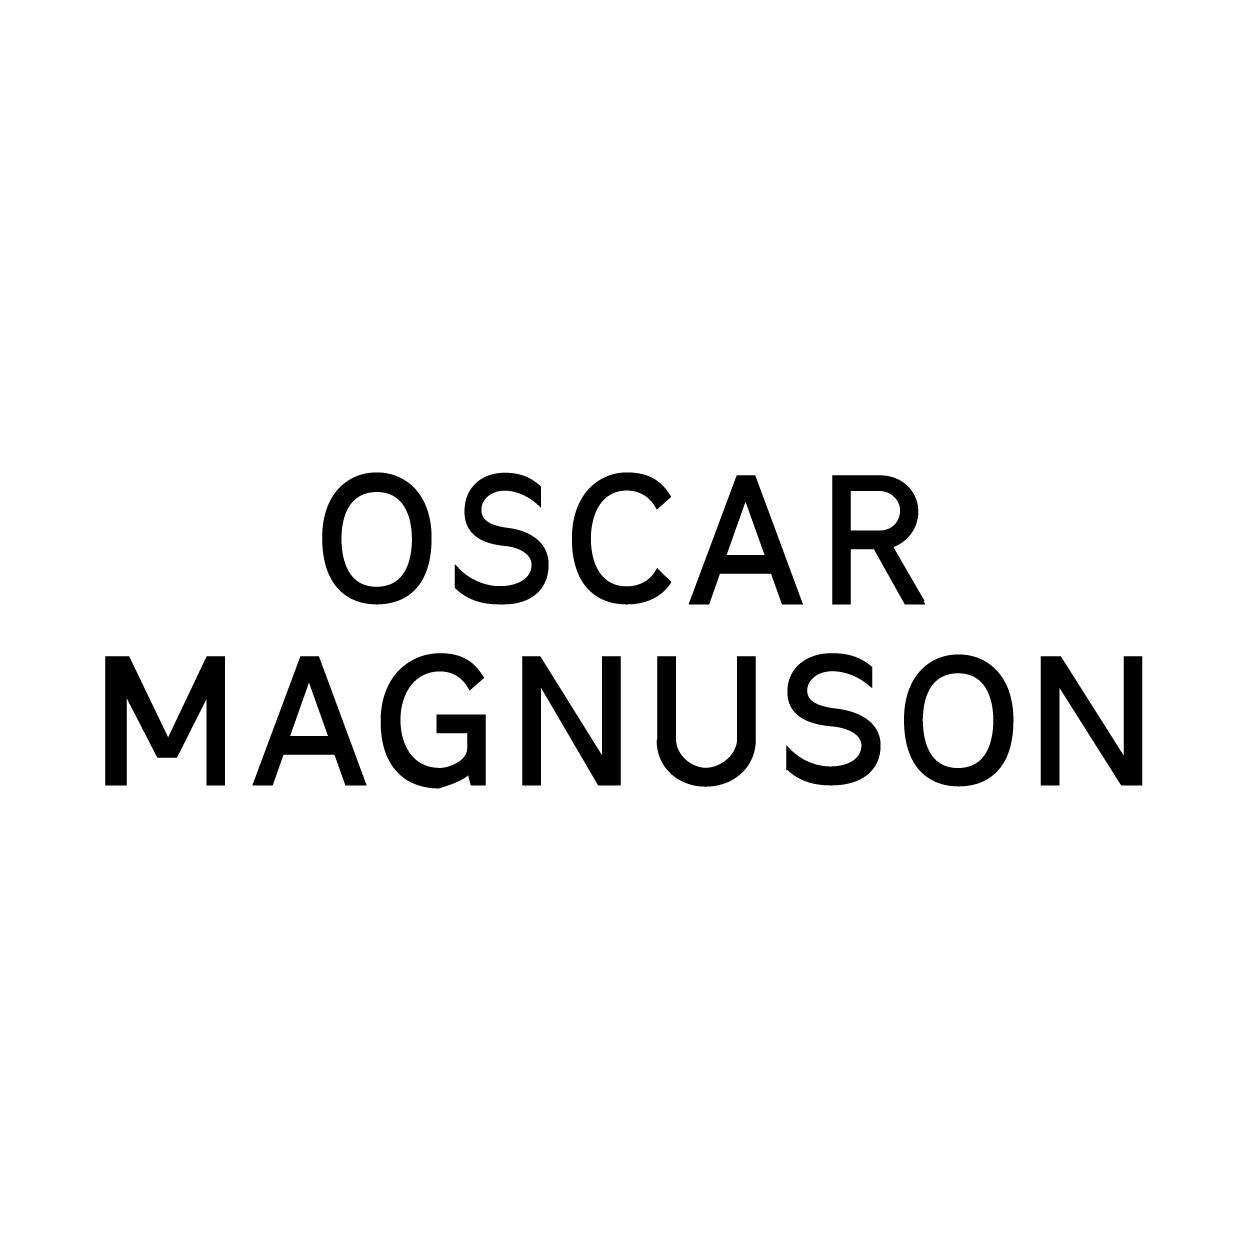 Oscar Magnuson